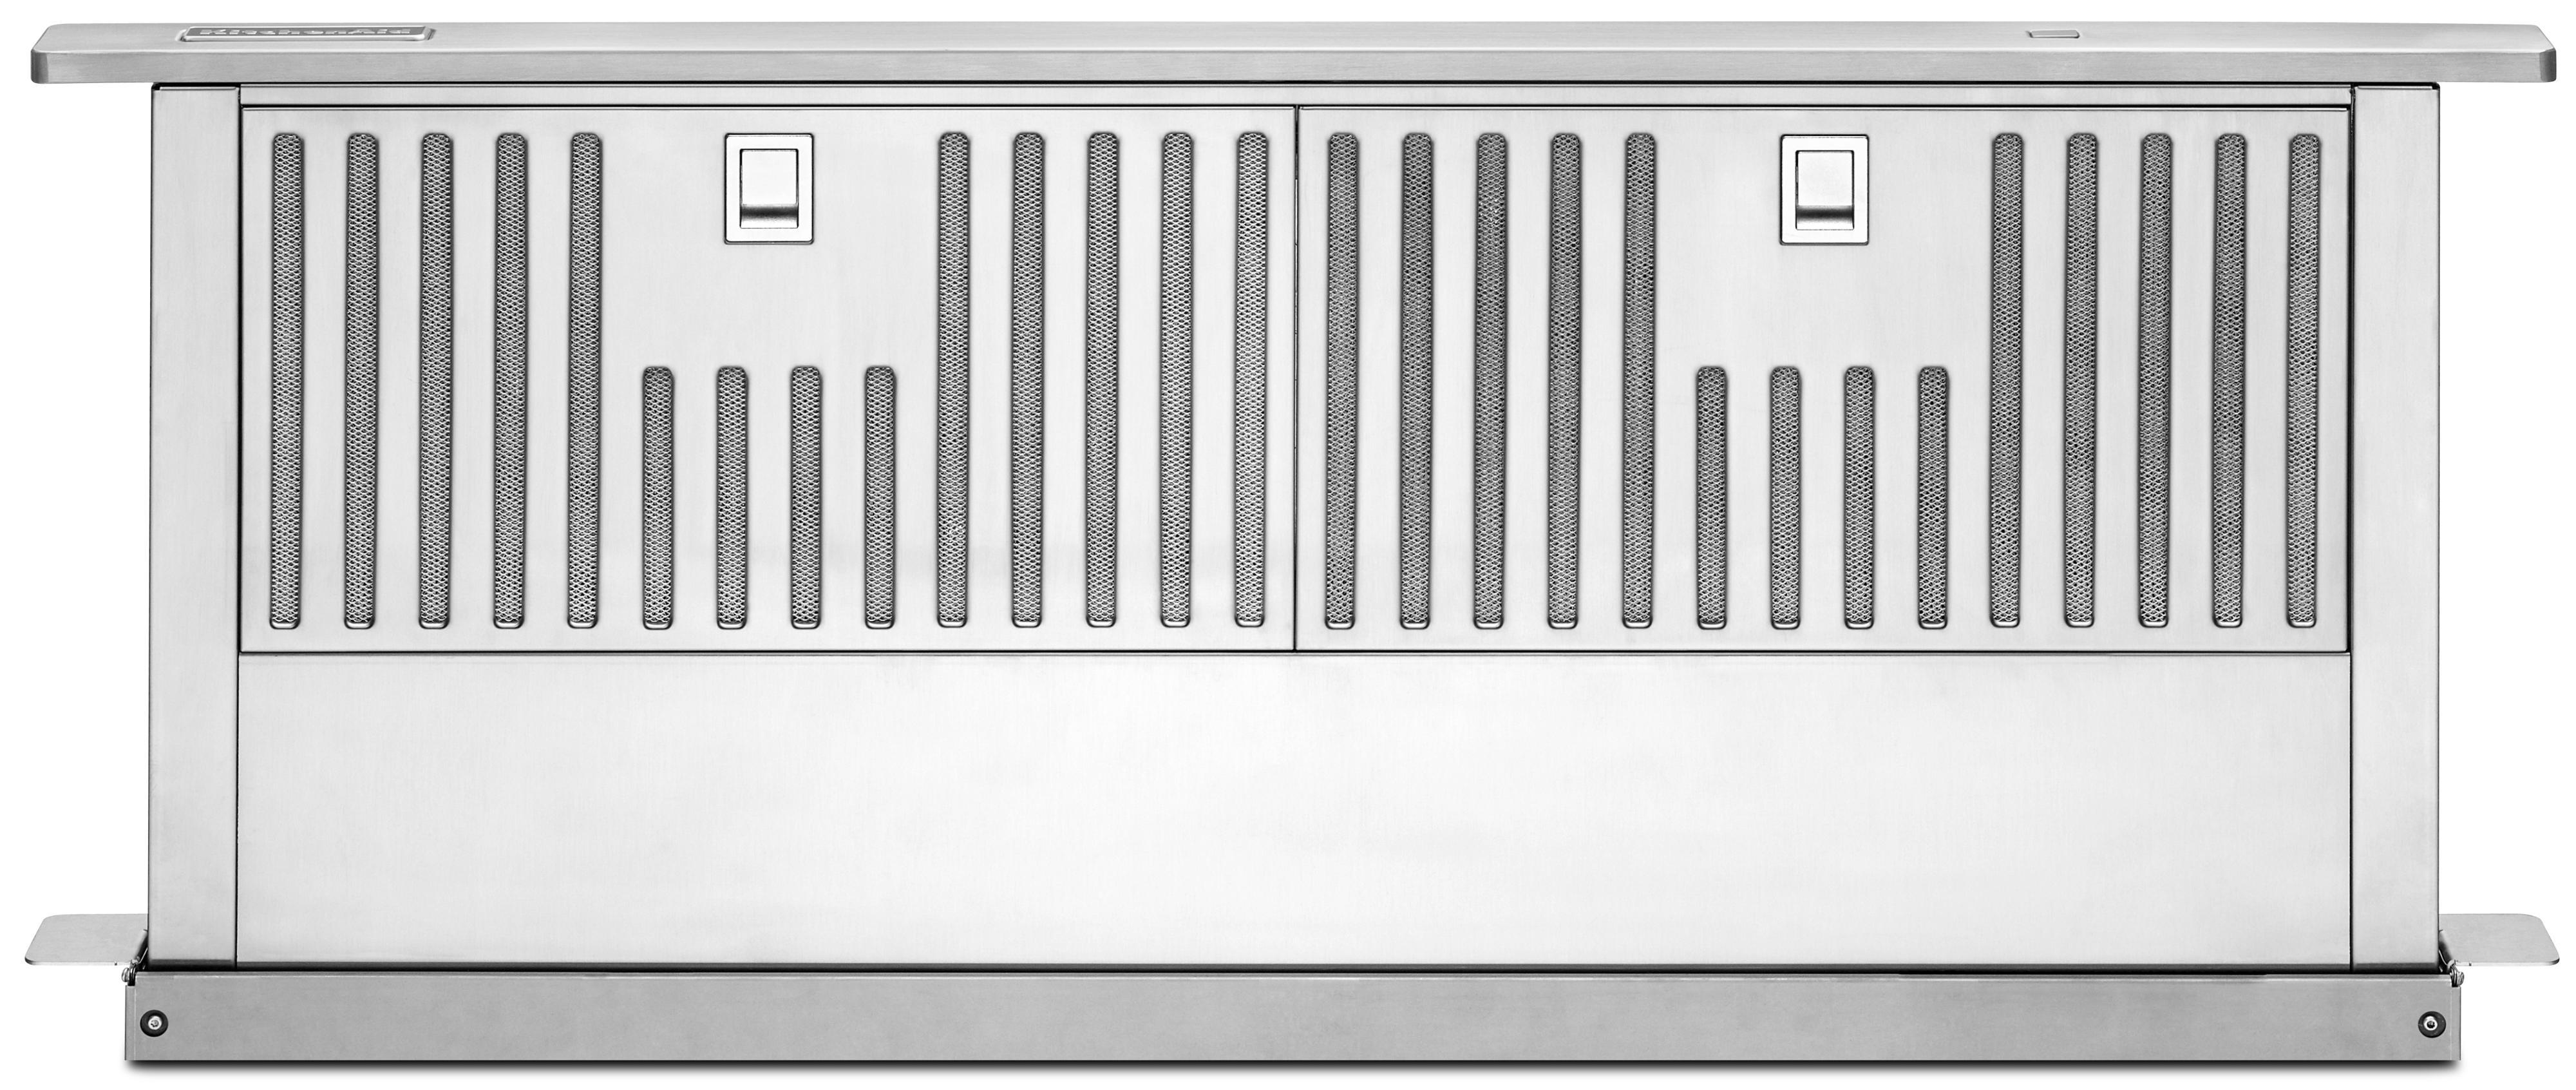 "KitchenAid Range Hoods 36"" Downdraft System - Item Number: KXD4636YSS"